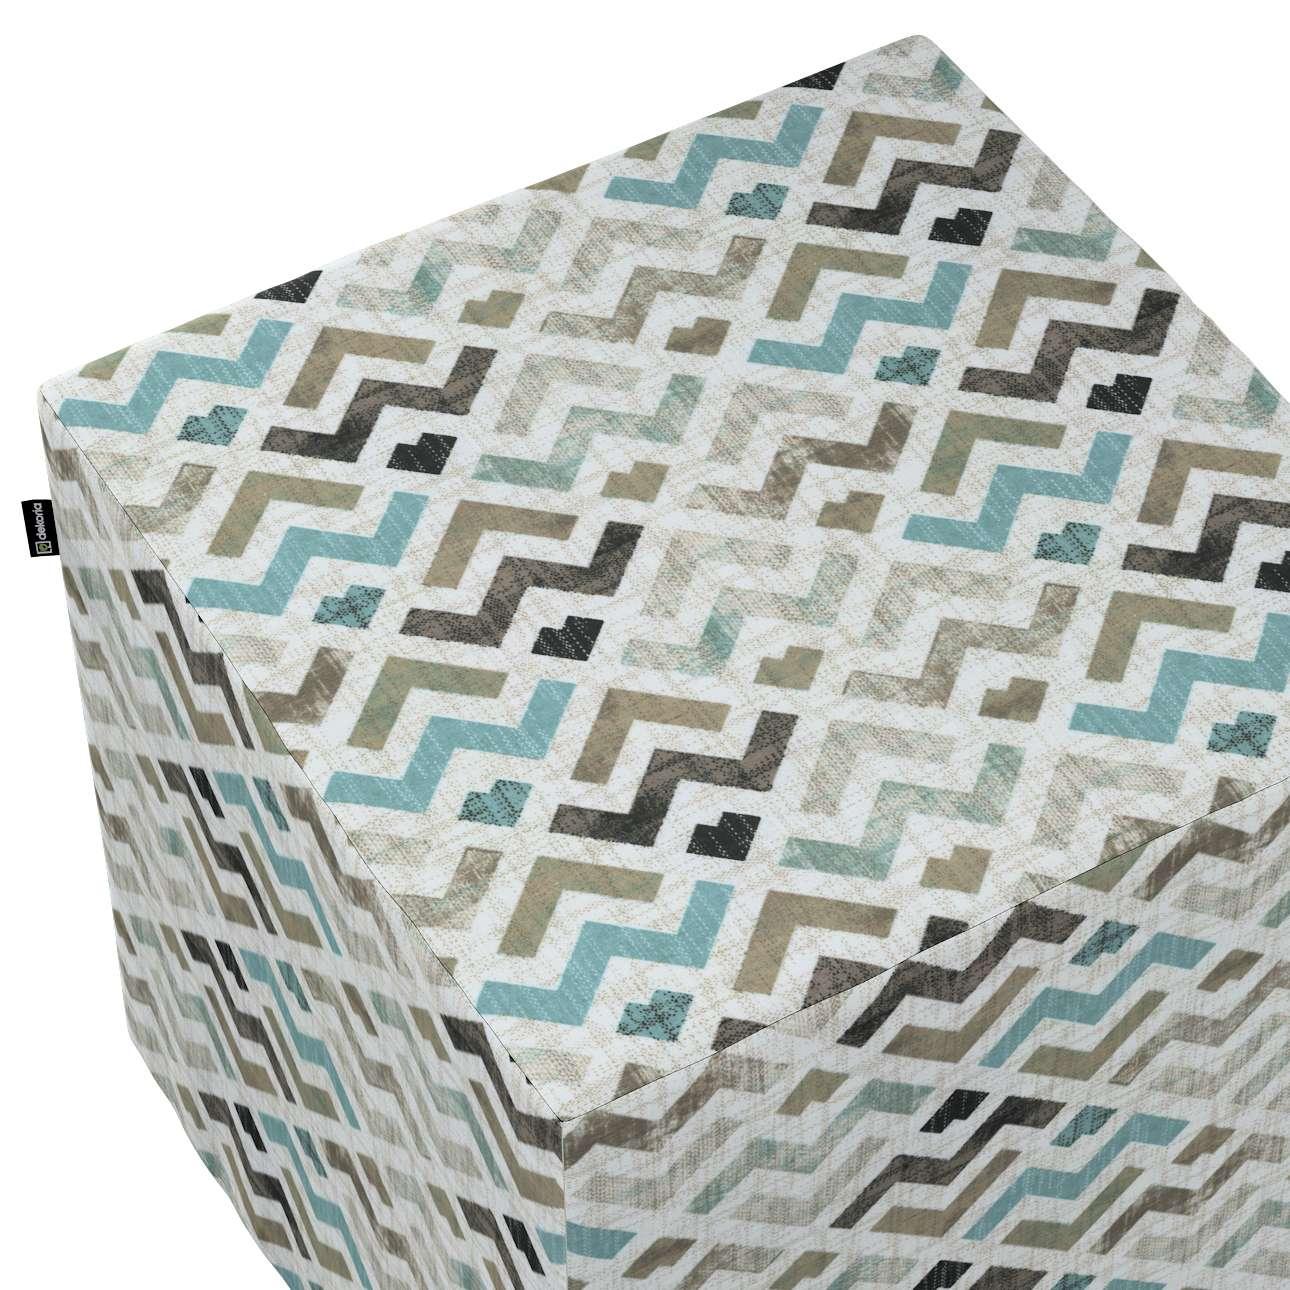 Pufa kostka w kolekcji Modern, tkanina: 141-93